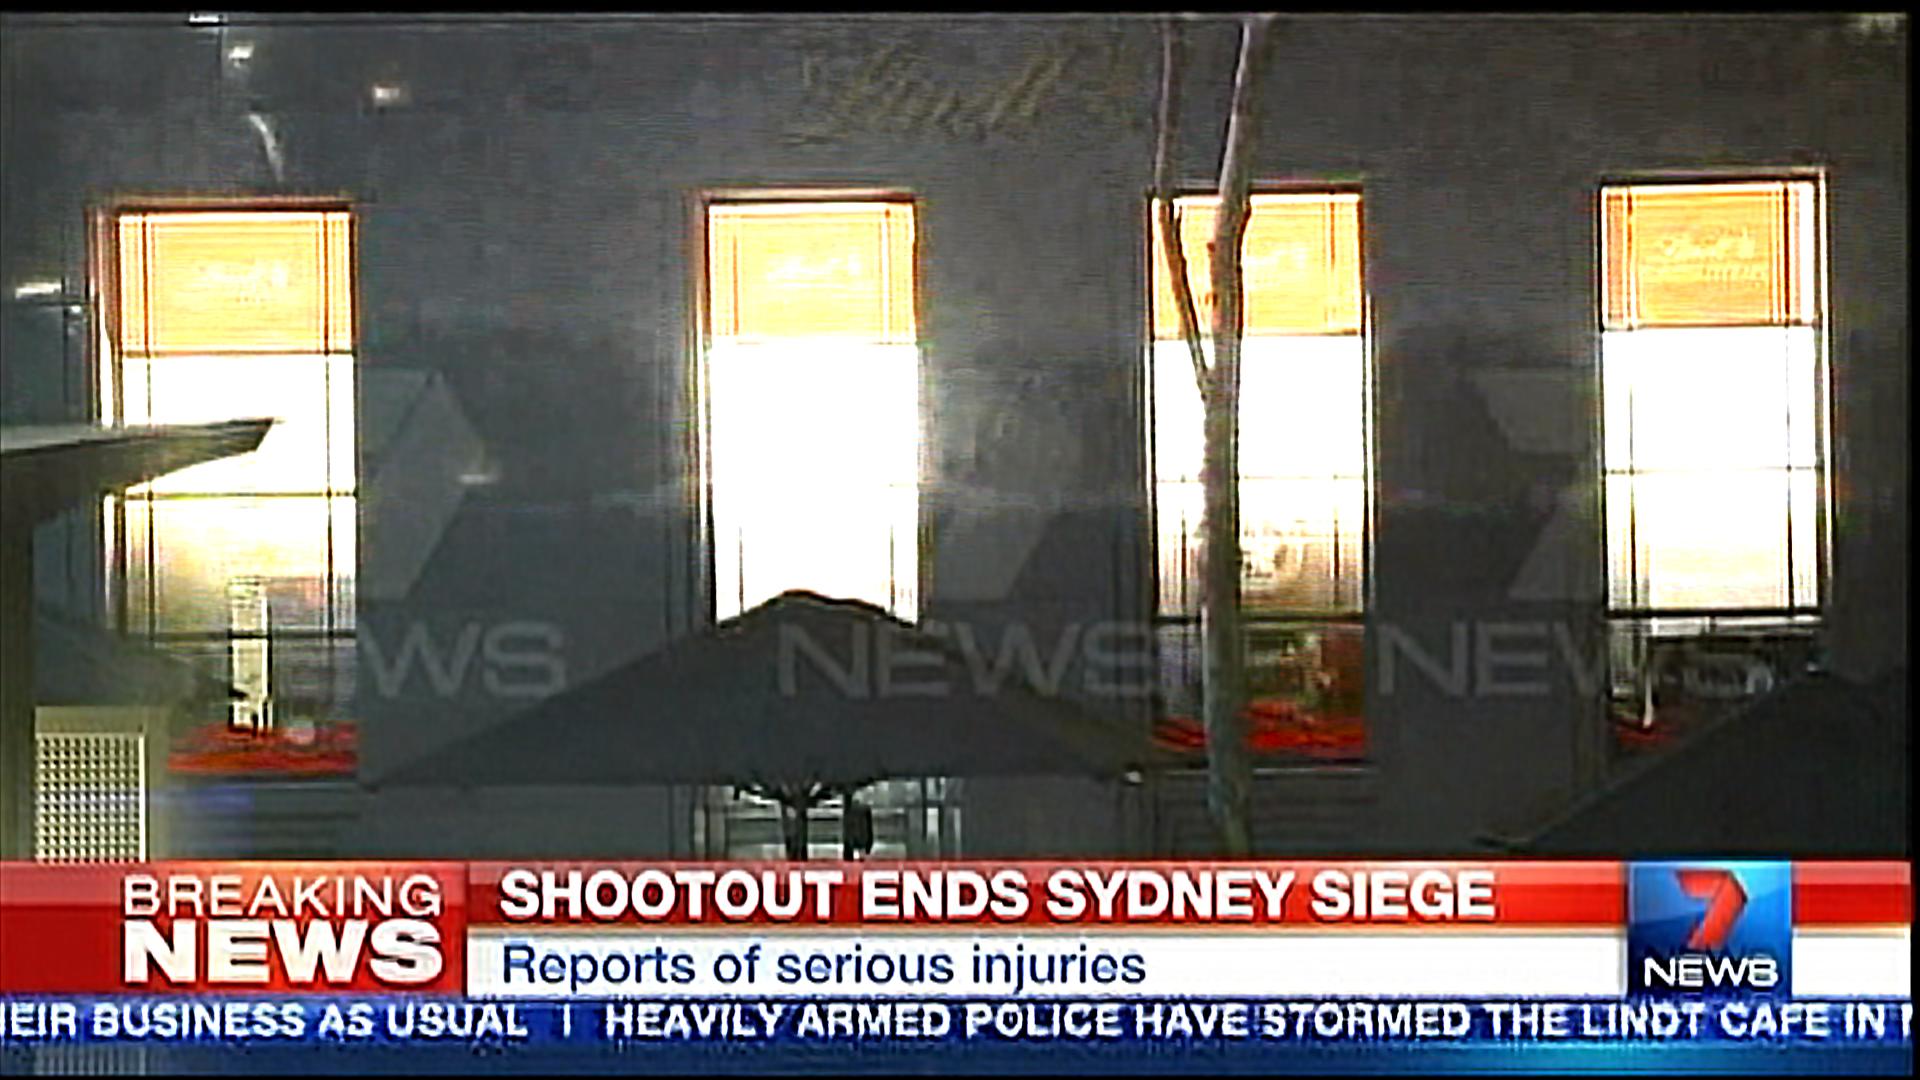 Sydney Siege Ends: Police Storm Cafe Where Man Haron Monis Held Hostages